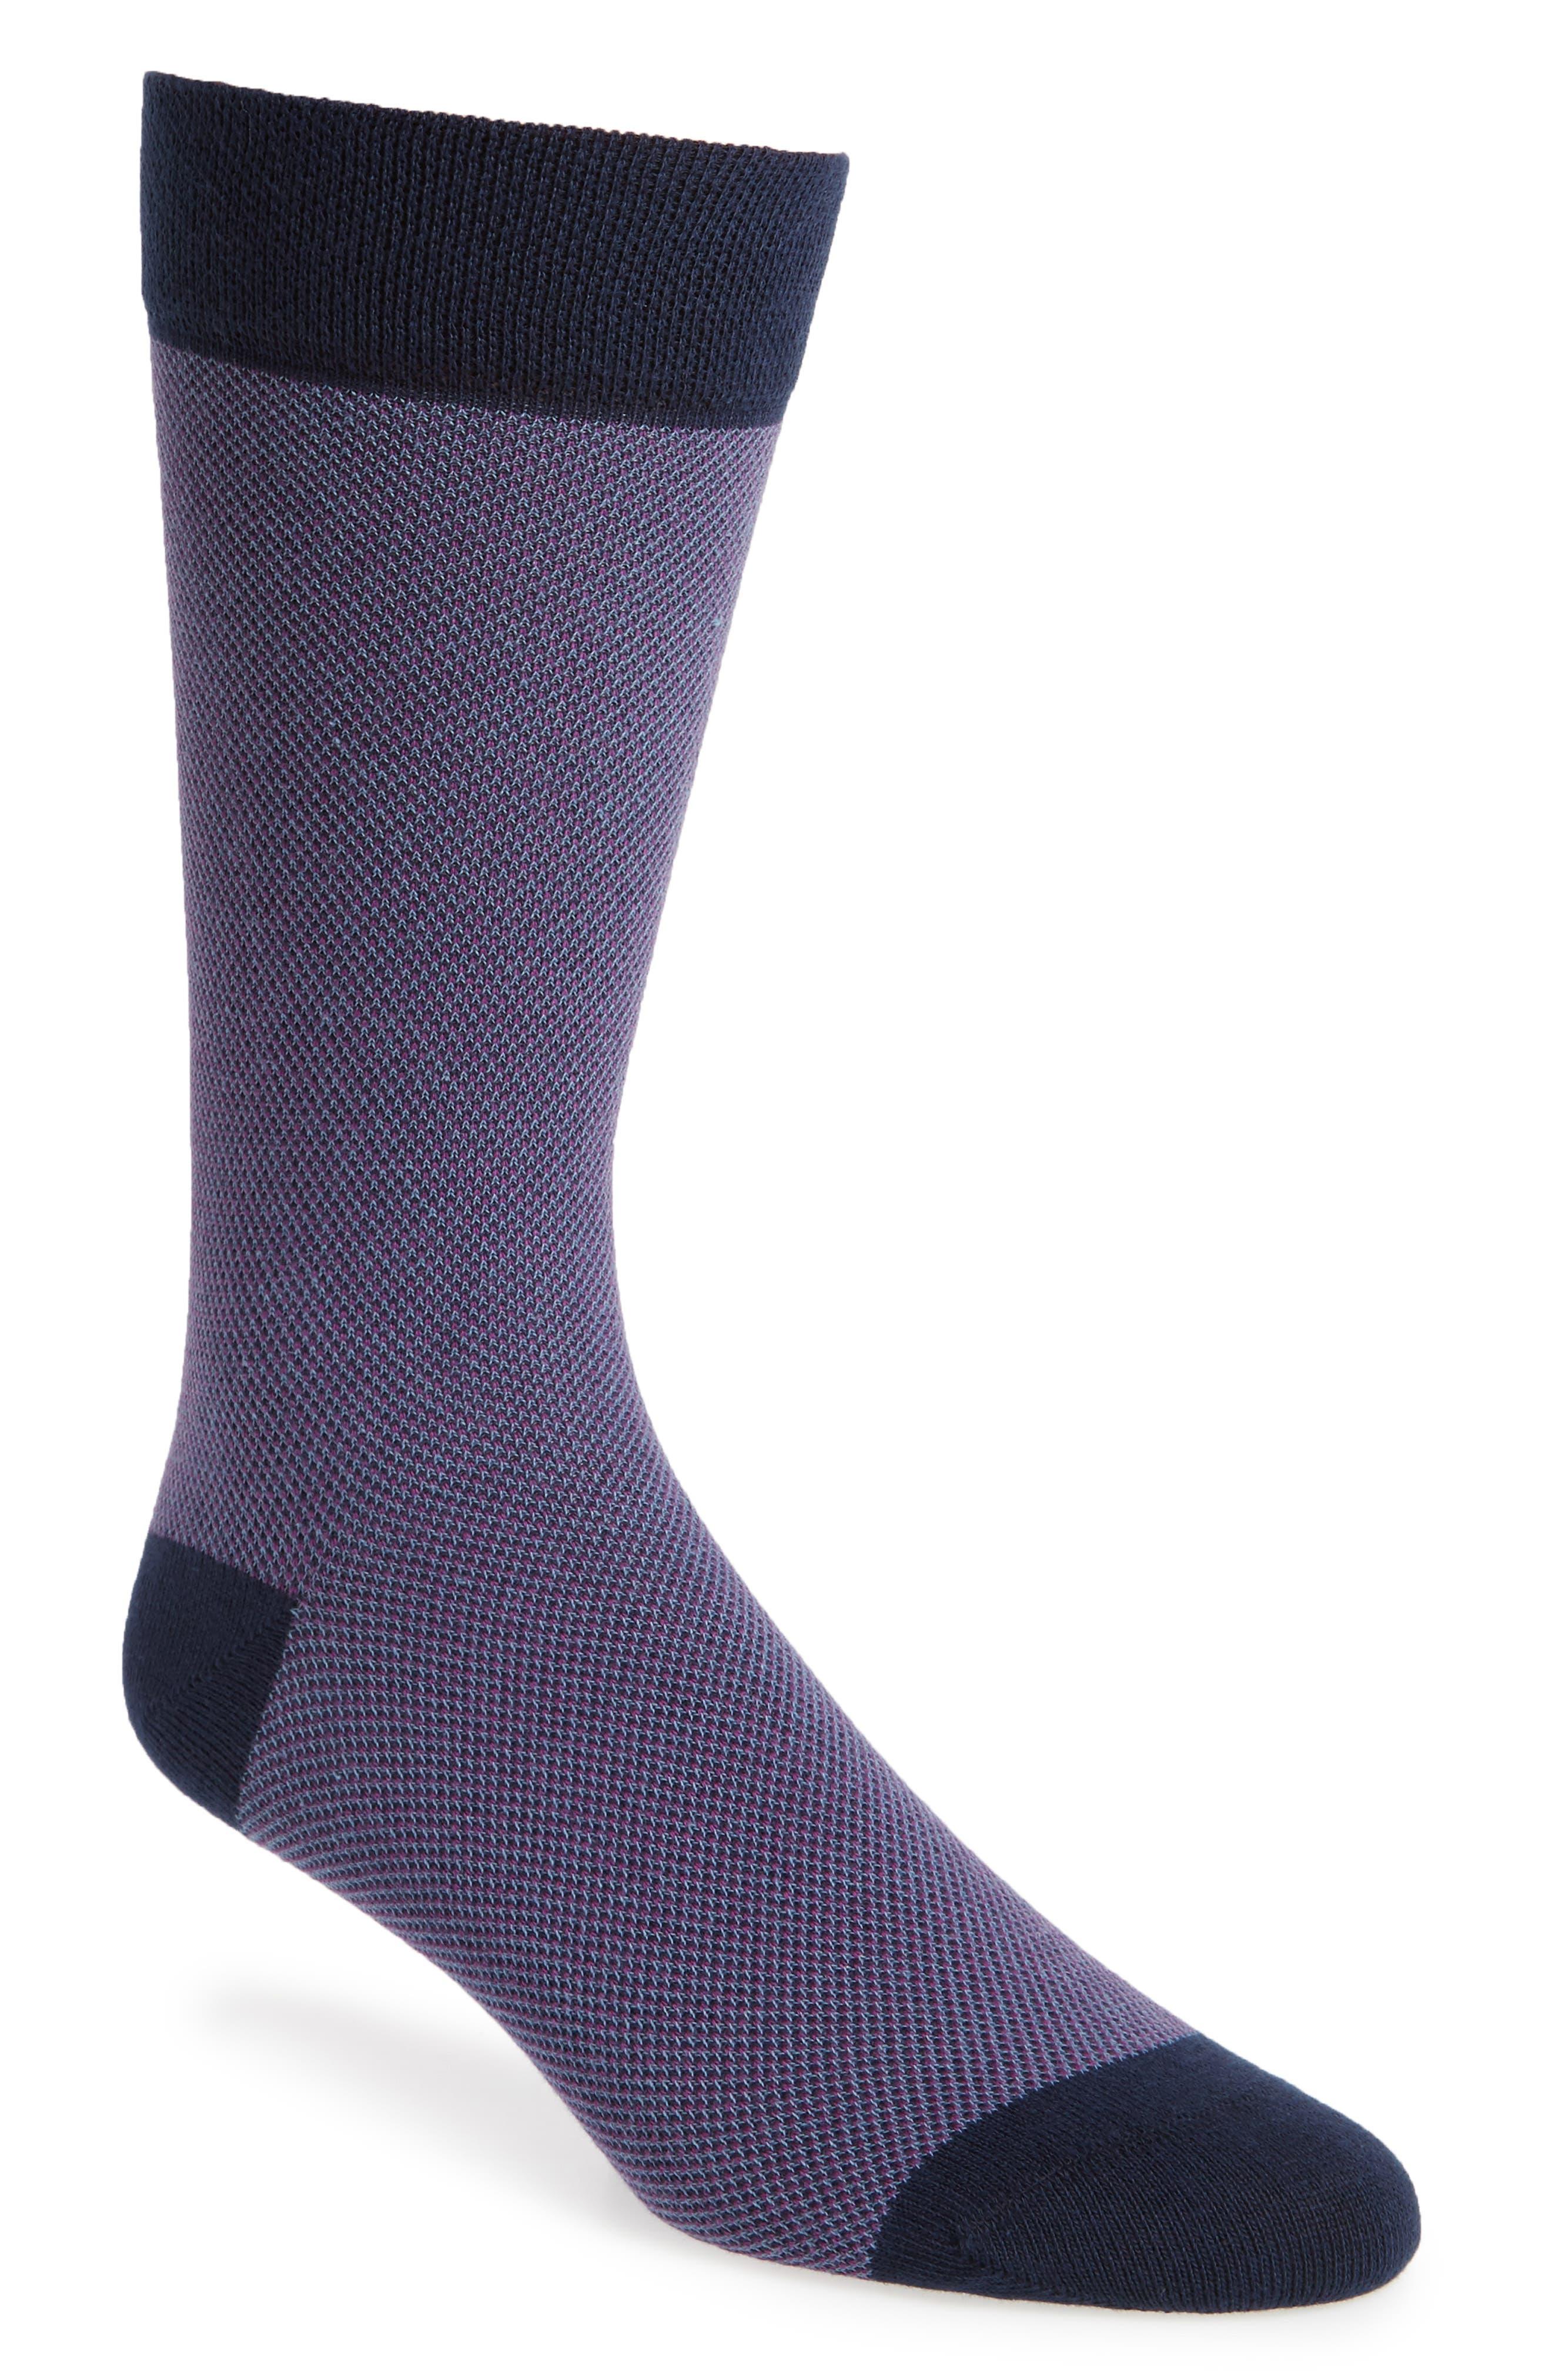 Joaquim Solid Socks,                             Main thumbnail 1, color,                             Purple